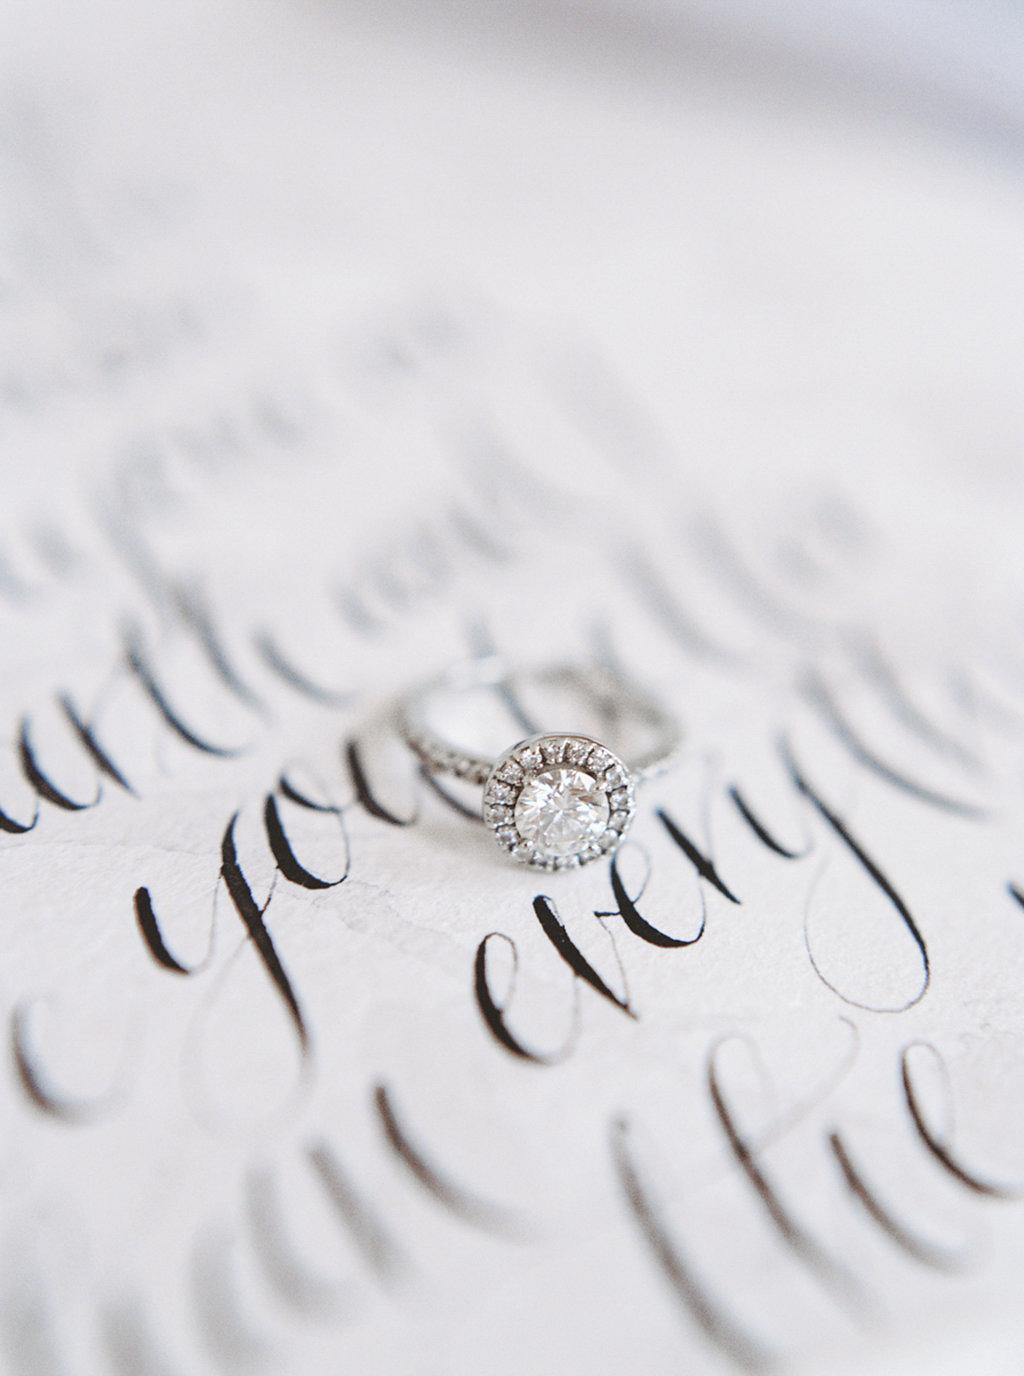 kayla-yestal-photography-vineyard-bride-swish-list-beamer-falls-manor-grimsby-engagement-15.jpg